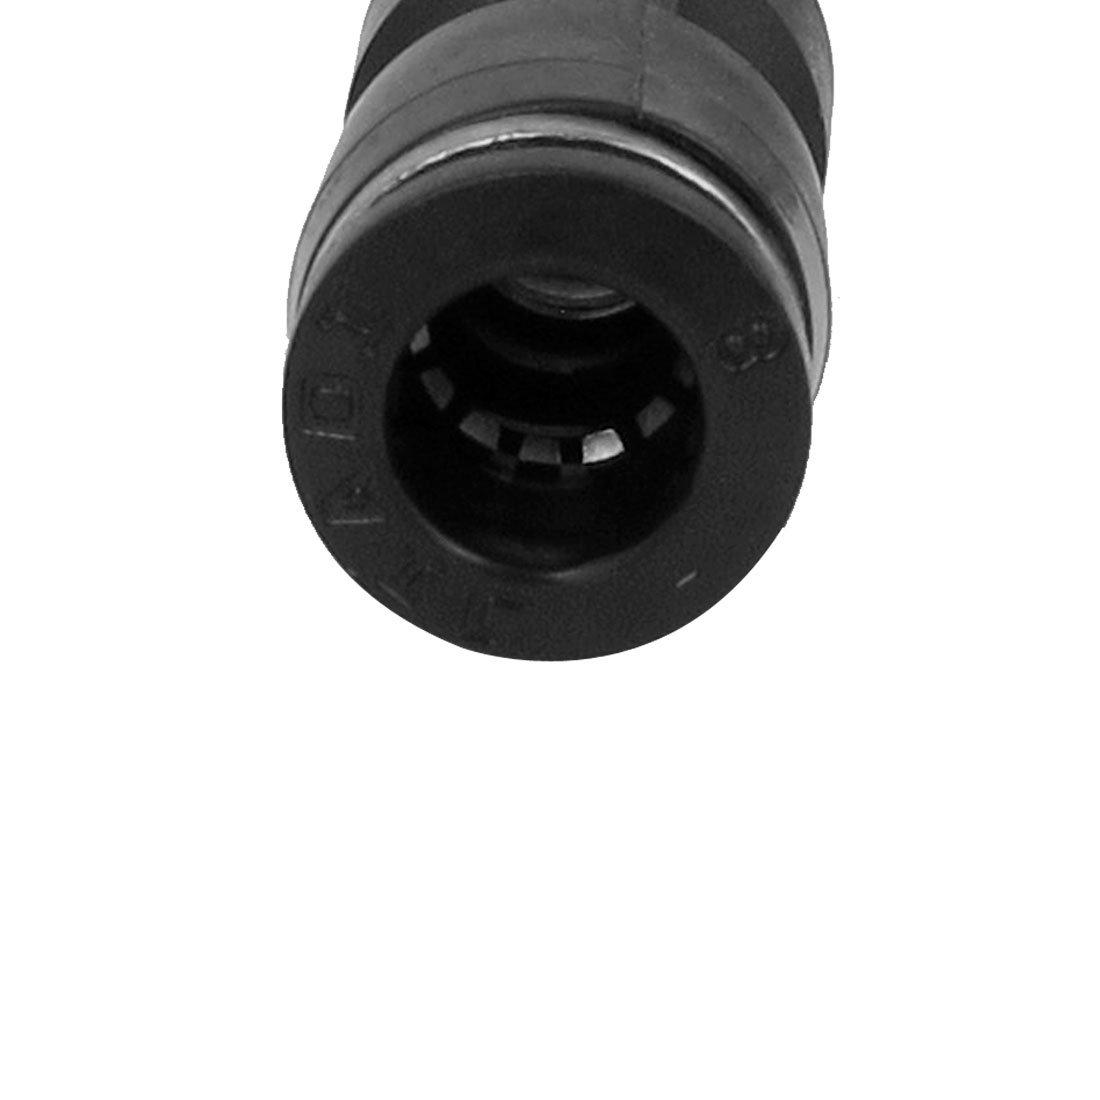 sourcingmap/® 20pcs Racor Junta Enlace Adaptador Conector Neum/ática de Aire R/ápido Empuje Adentro Para Conectar La Tuber/ía de 8mm Di/ámetro Exterior Recta